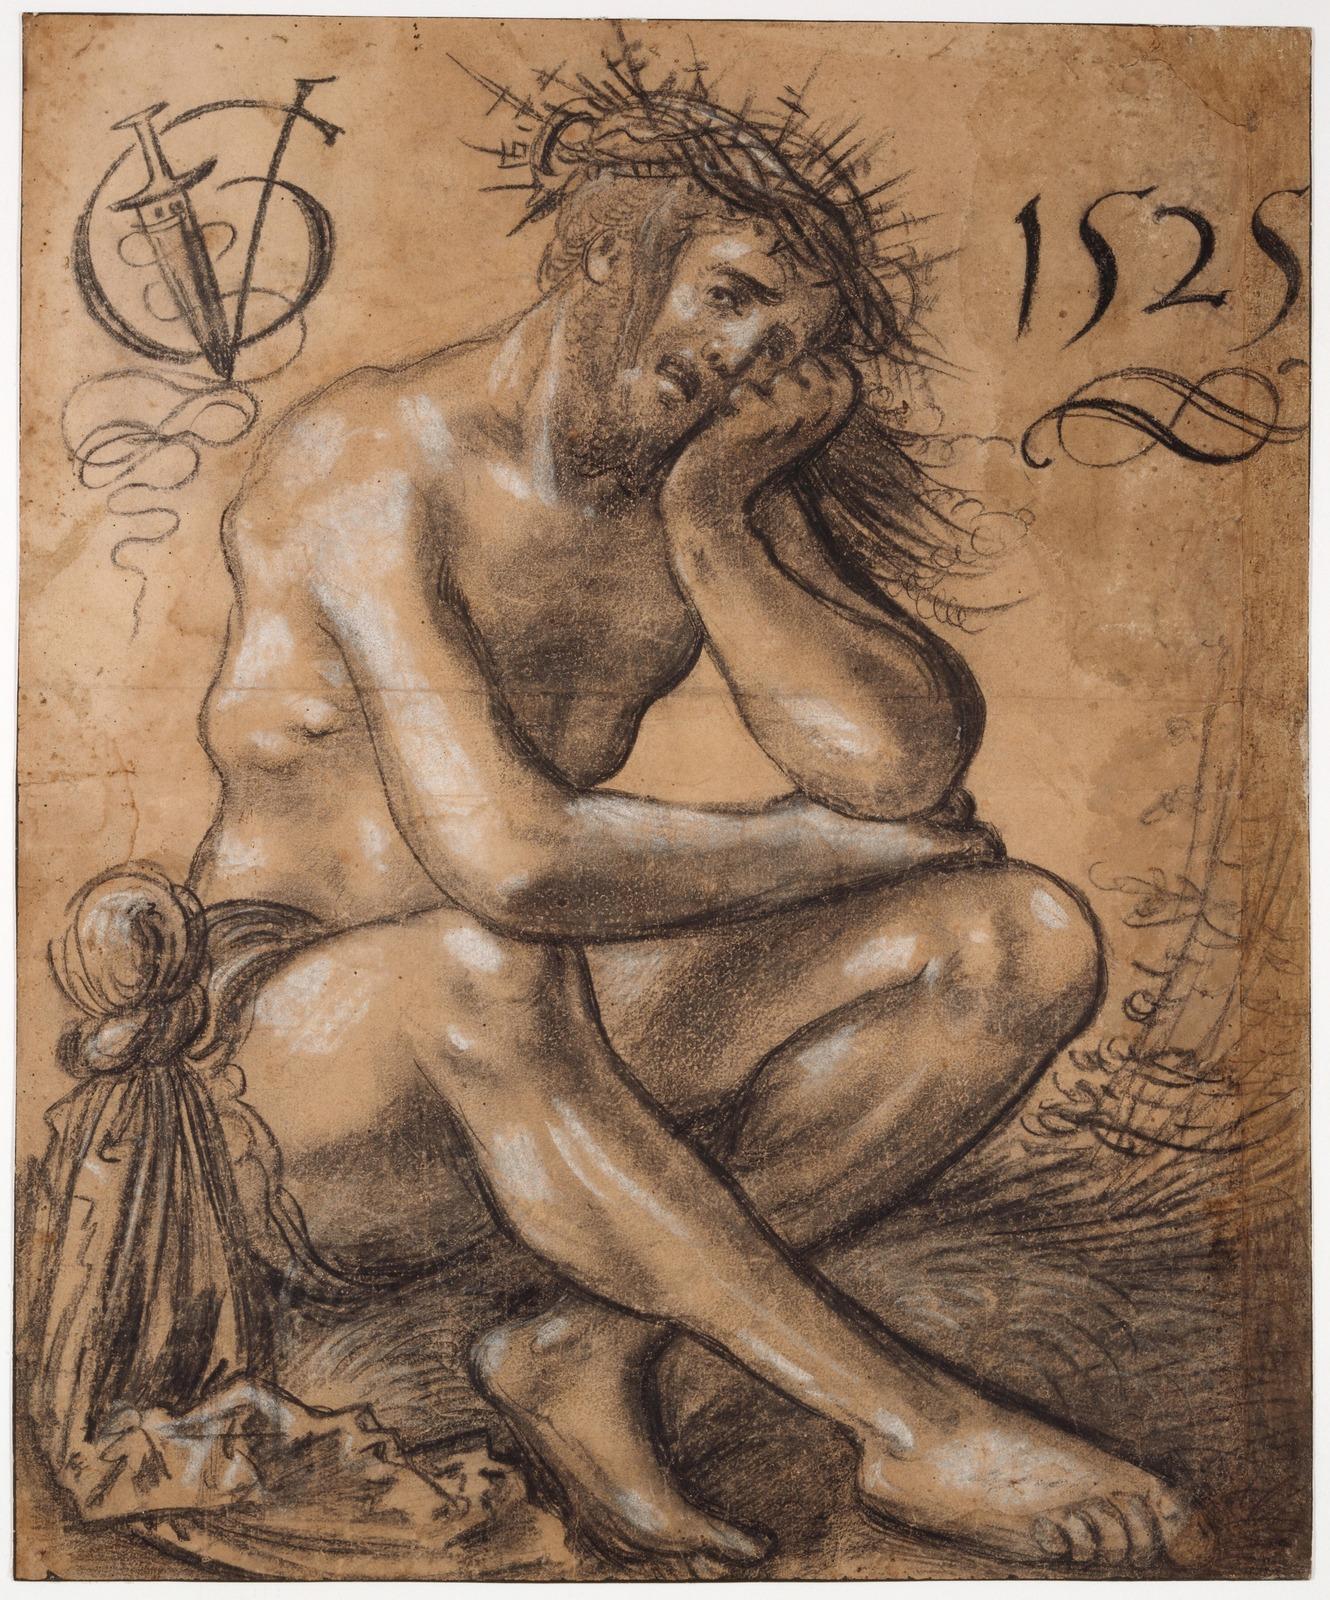 Скорбящий Христос (Christus in der Rast)_1525_45 х 35_черный и белый мел_Базель, Кунстмузеум.jpg